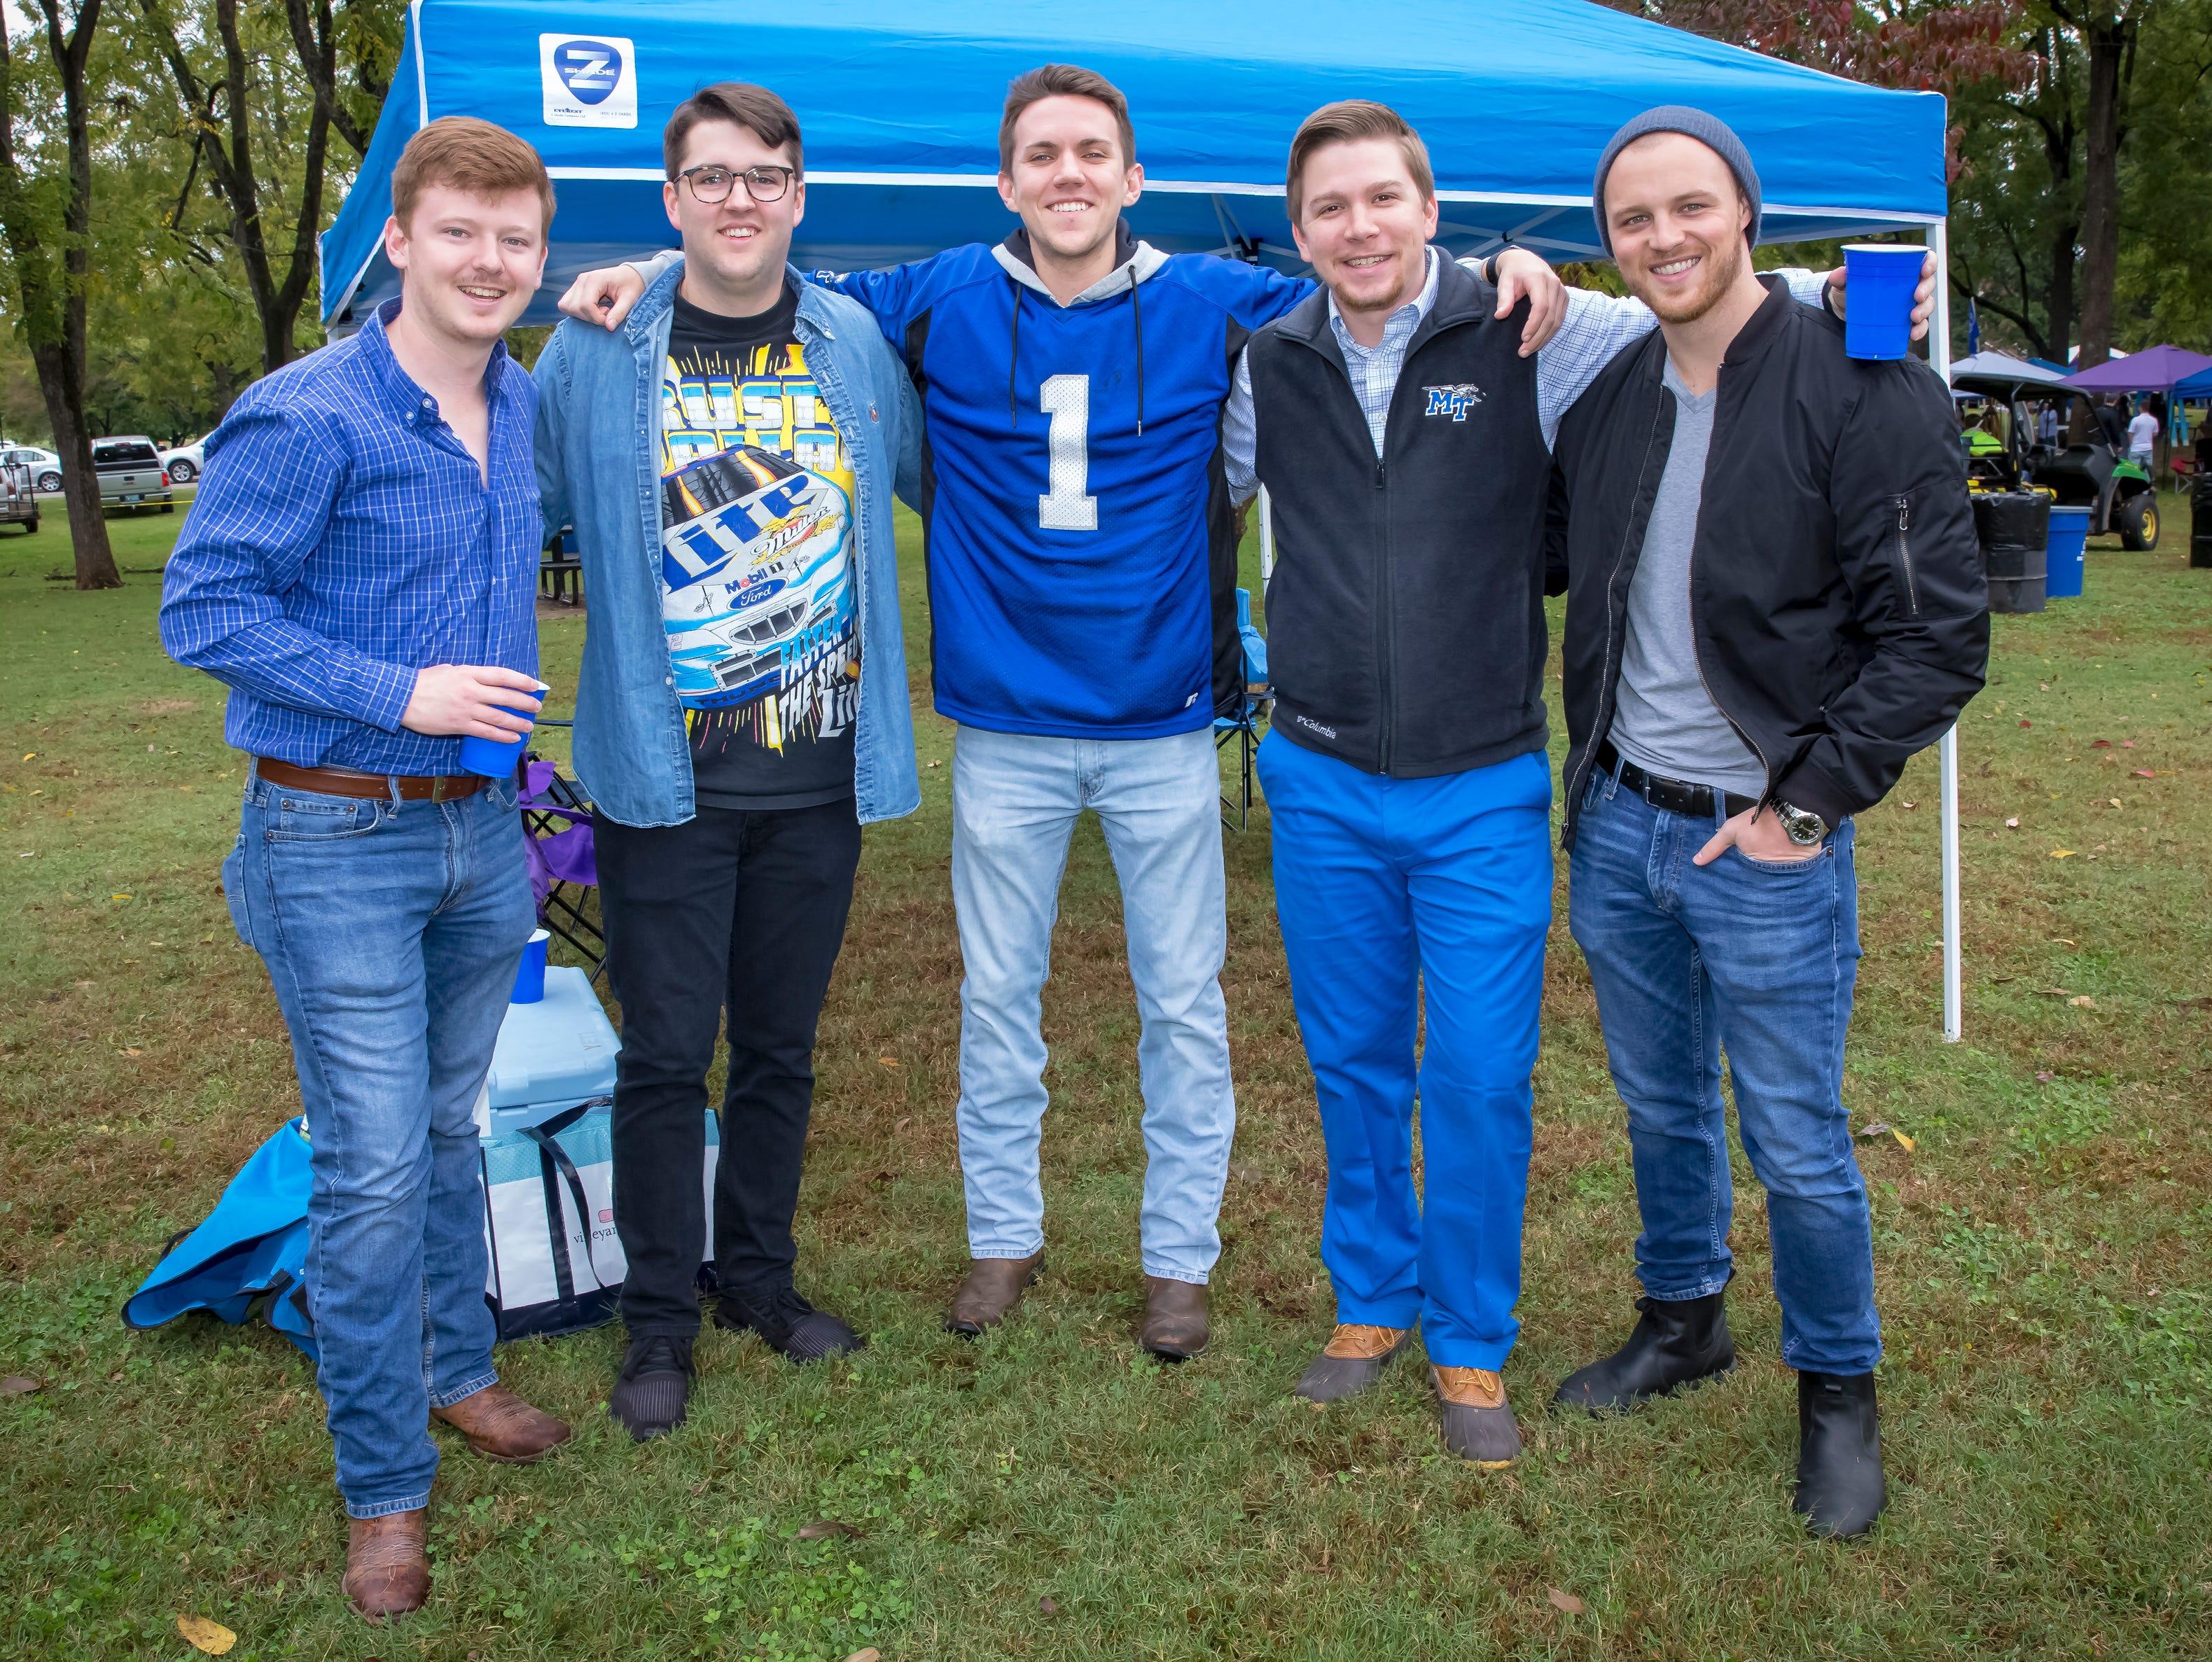 Cody Pratt, Ethan Hall, Patrick Fraser, Seth Sides and Jonathan McNutt  tailgating at MTSU homecoming.